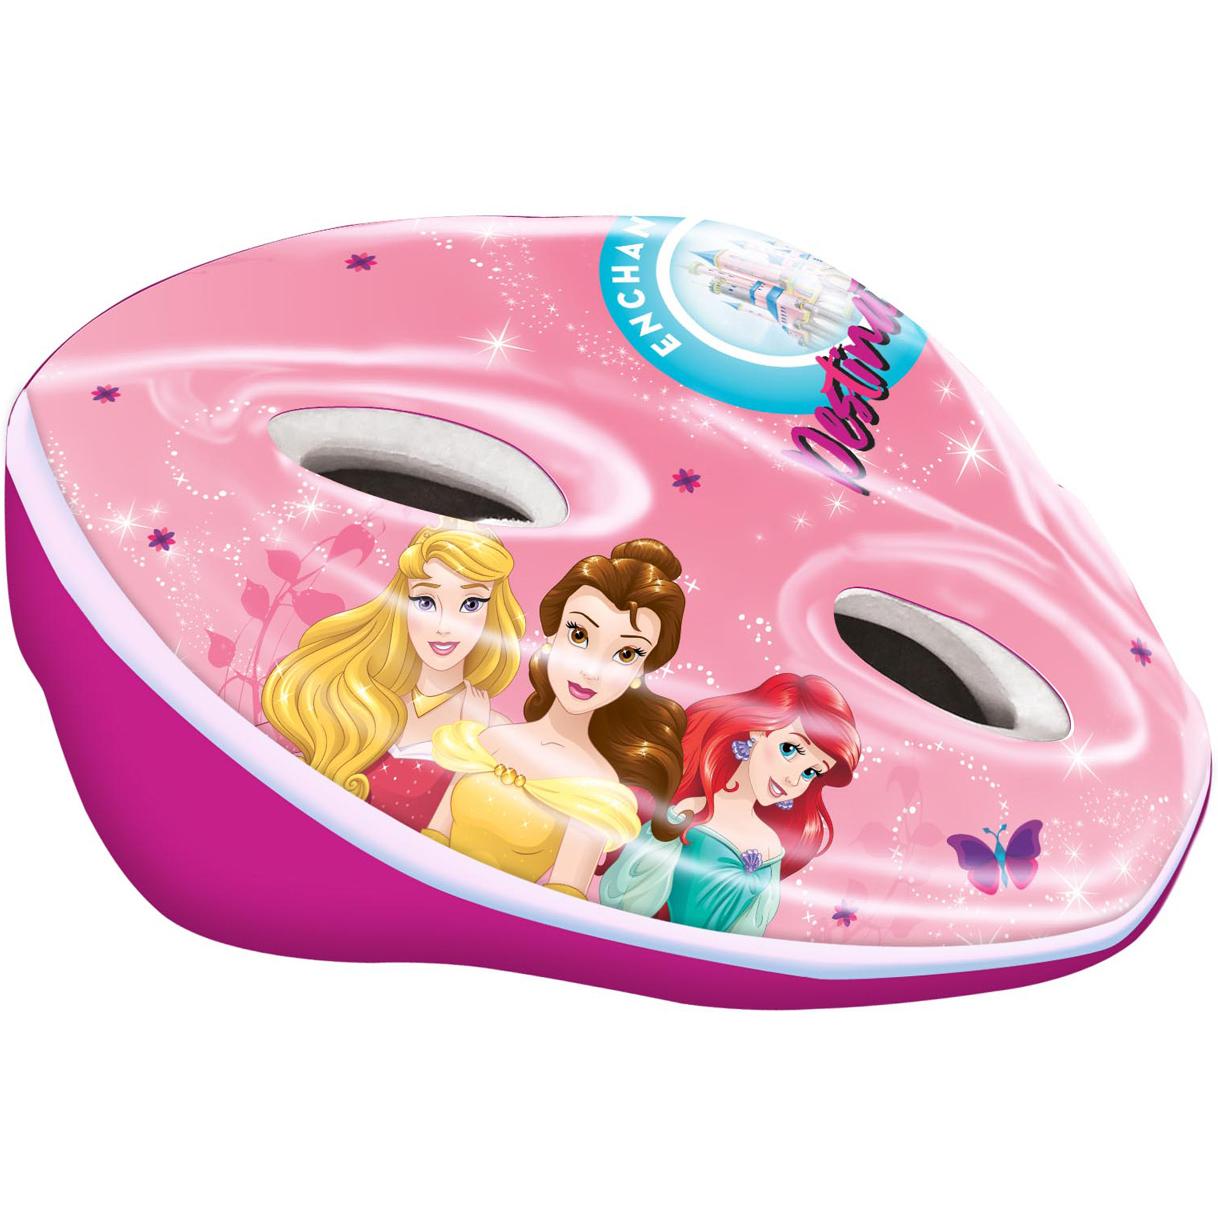 Casca de protectie Princess 52-56 cm Disney MD2208061 imagine